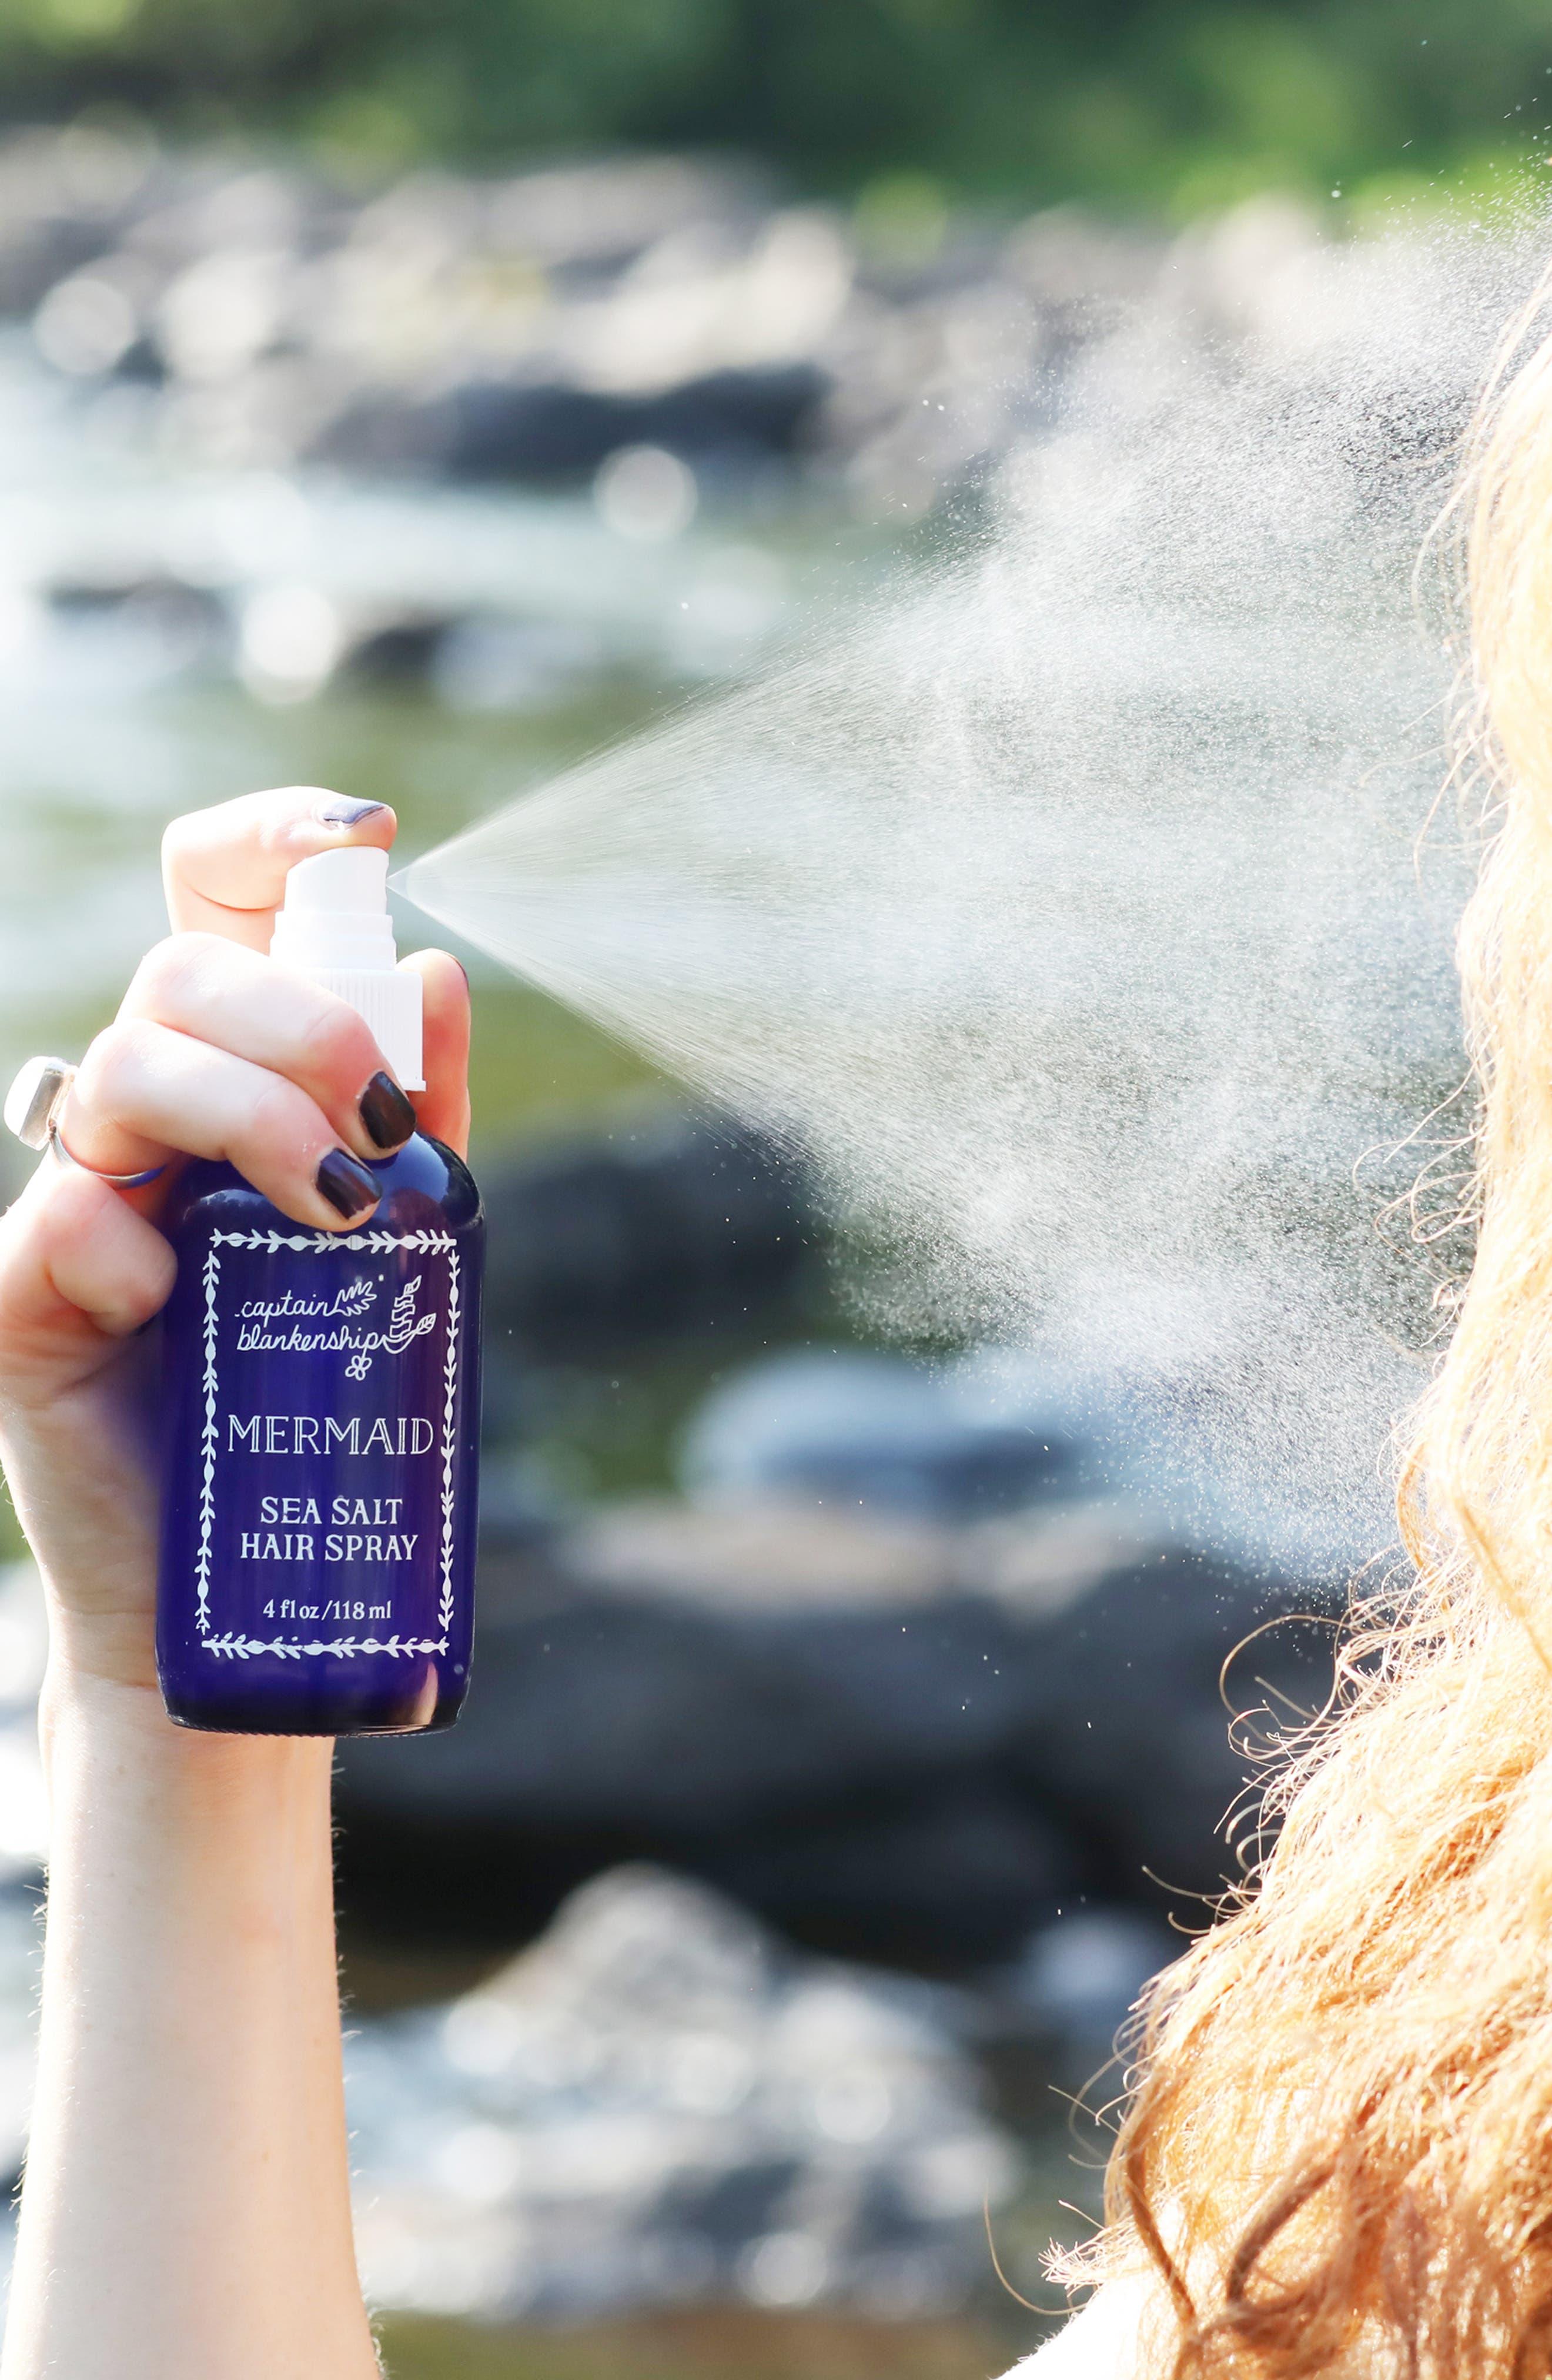 CAPTAIN BLANKENSHIP, Mermaid Sea Salt Hair Spray, Alternate thumbnail 2, color, 040